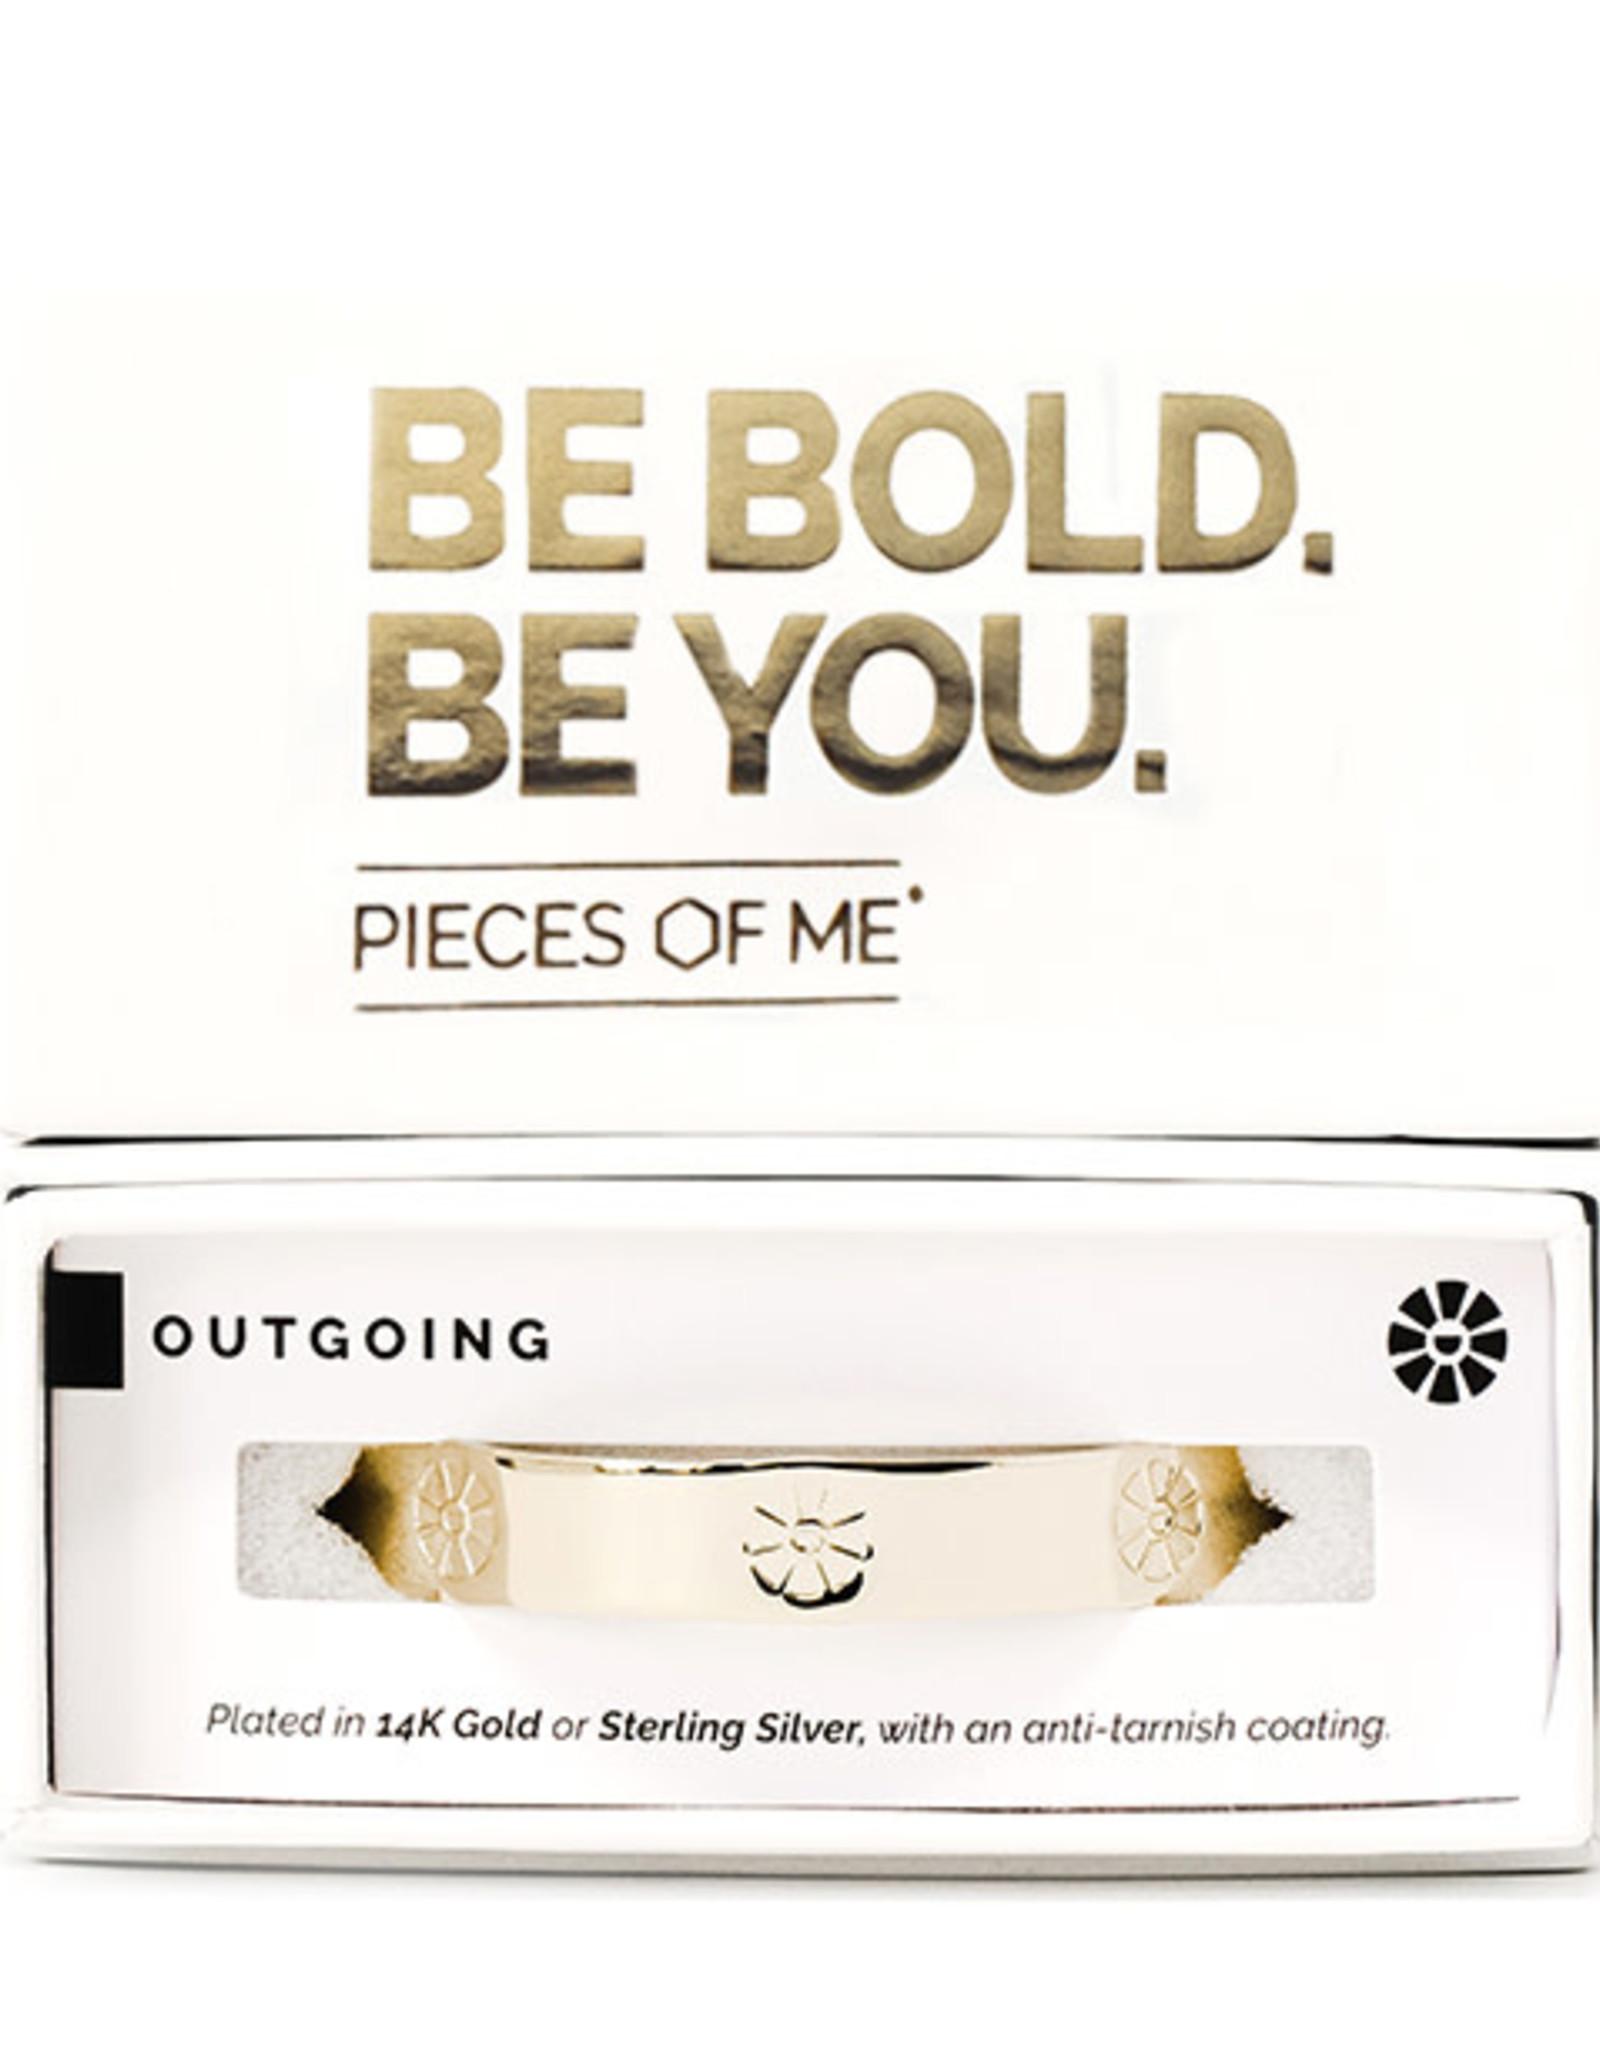 Pieces of Me Bracelet Outgoing Gold